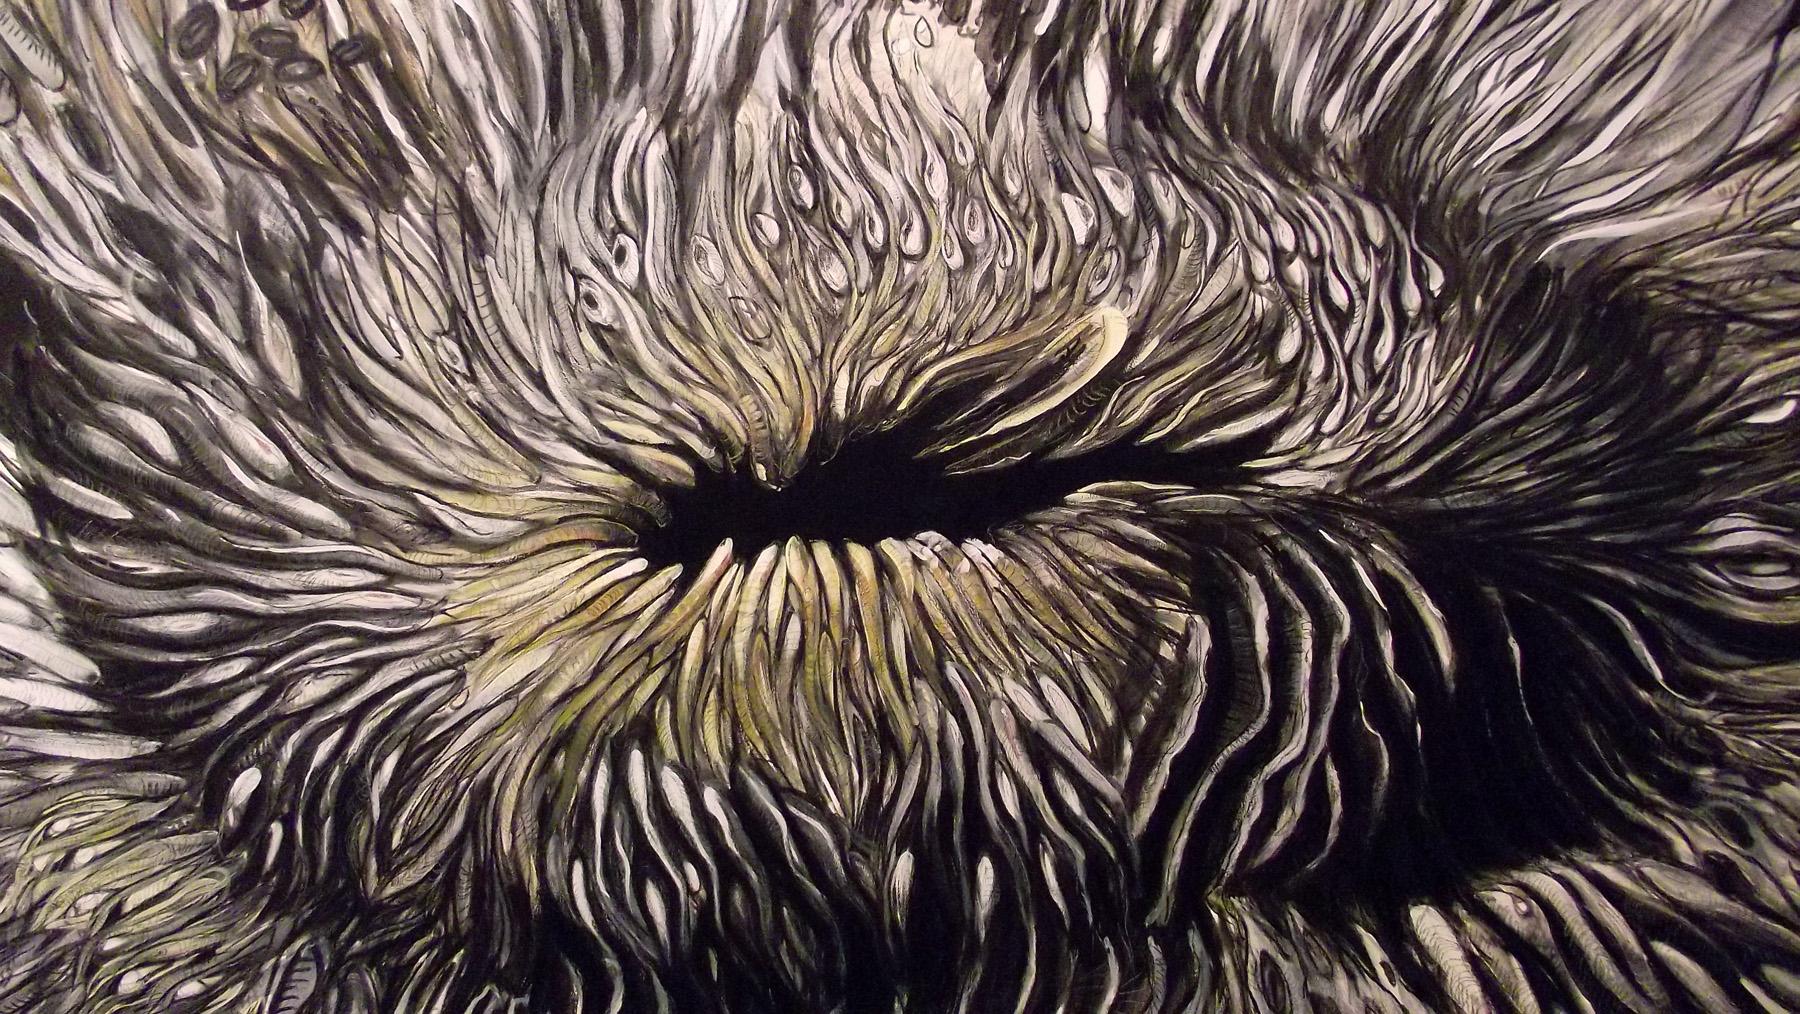 rohini-devasher-copyright-mimic-wall-drawing-2012 (5)